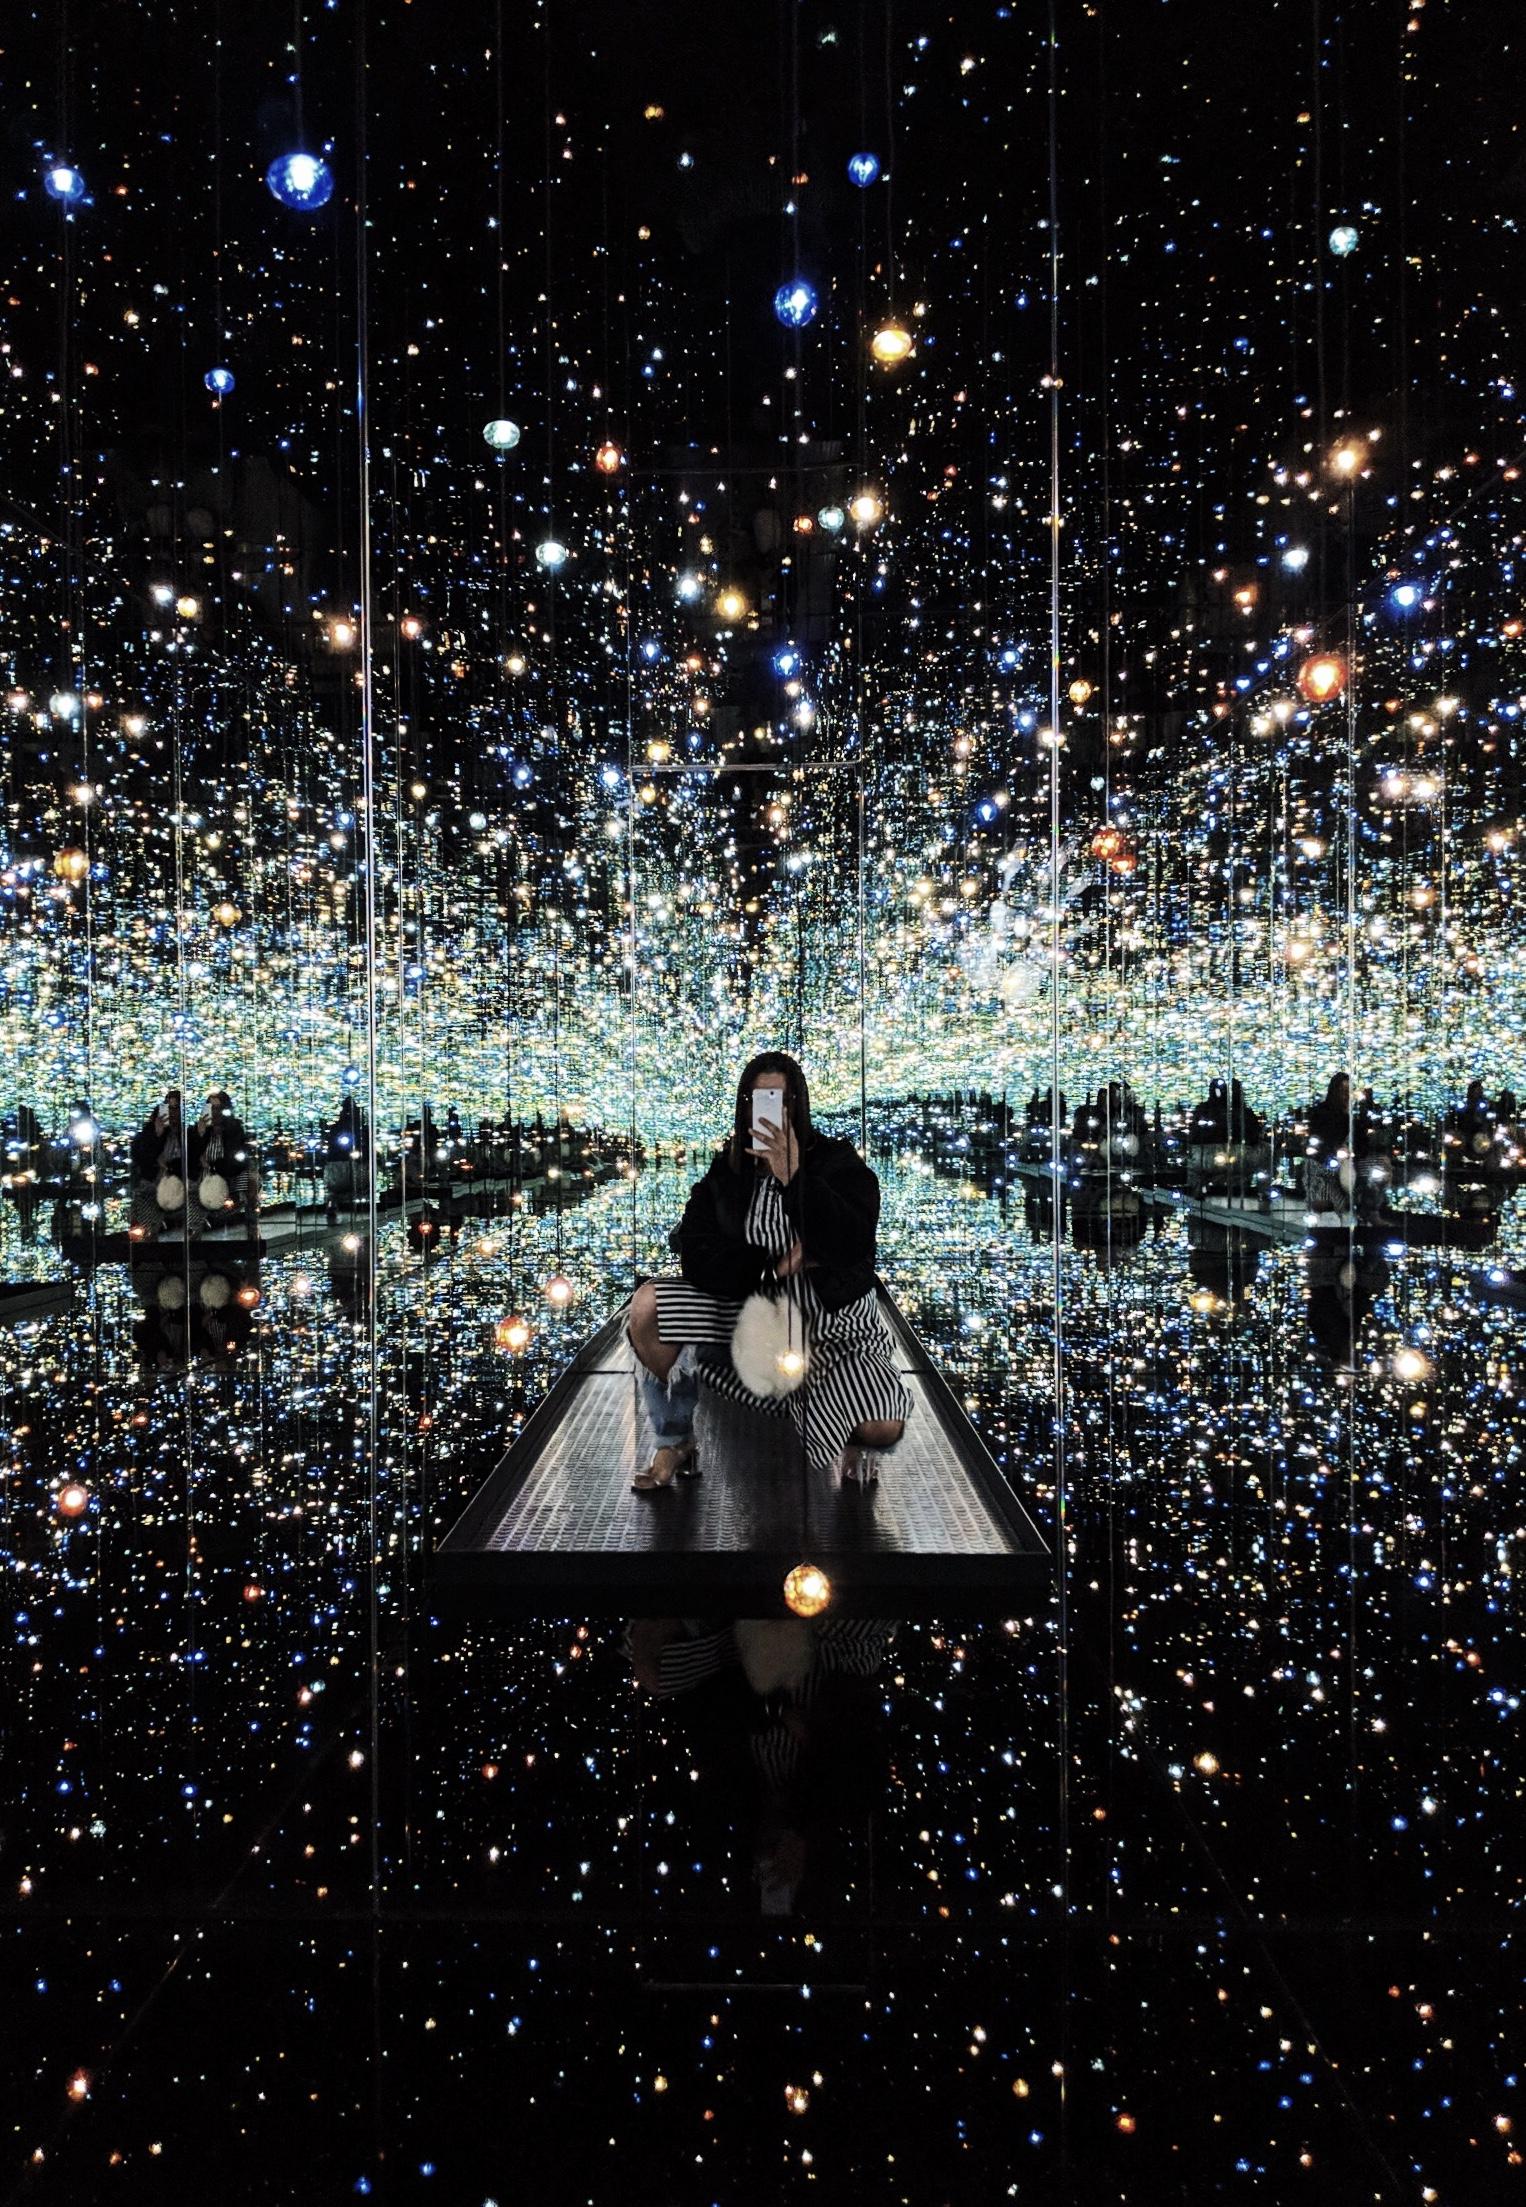 Yayoi Kusama at The Broad, Pixel 2 Camera Review